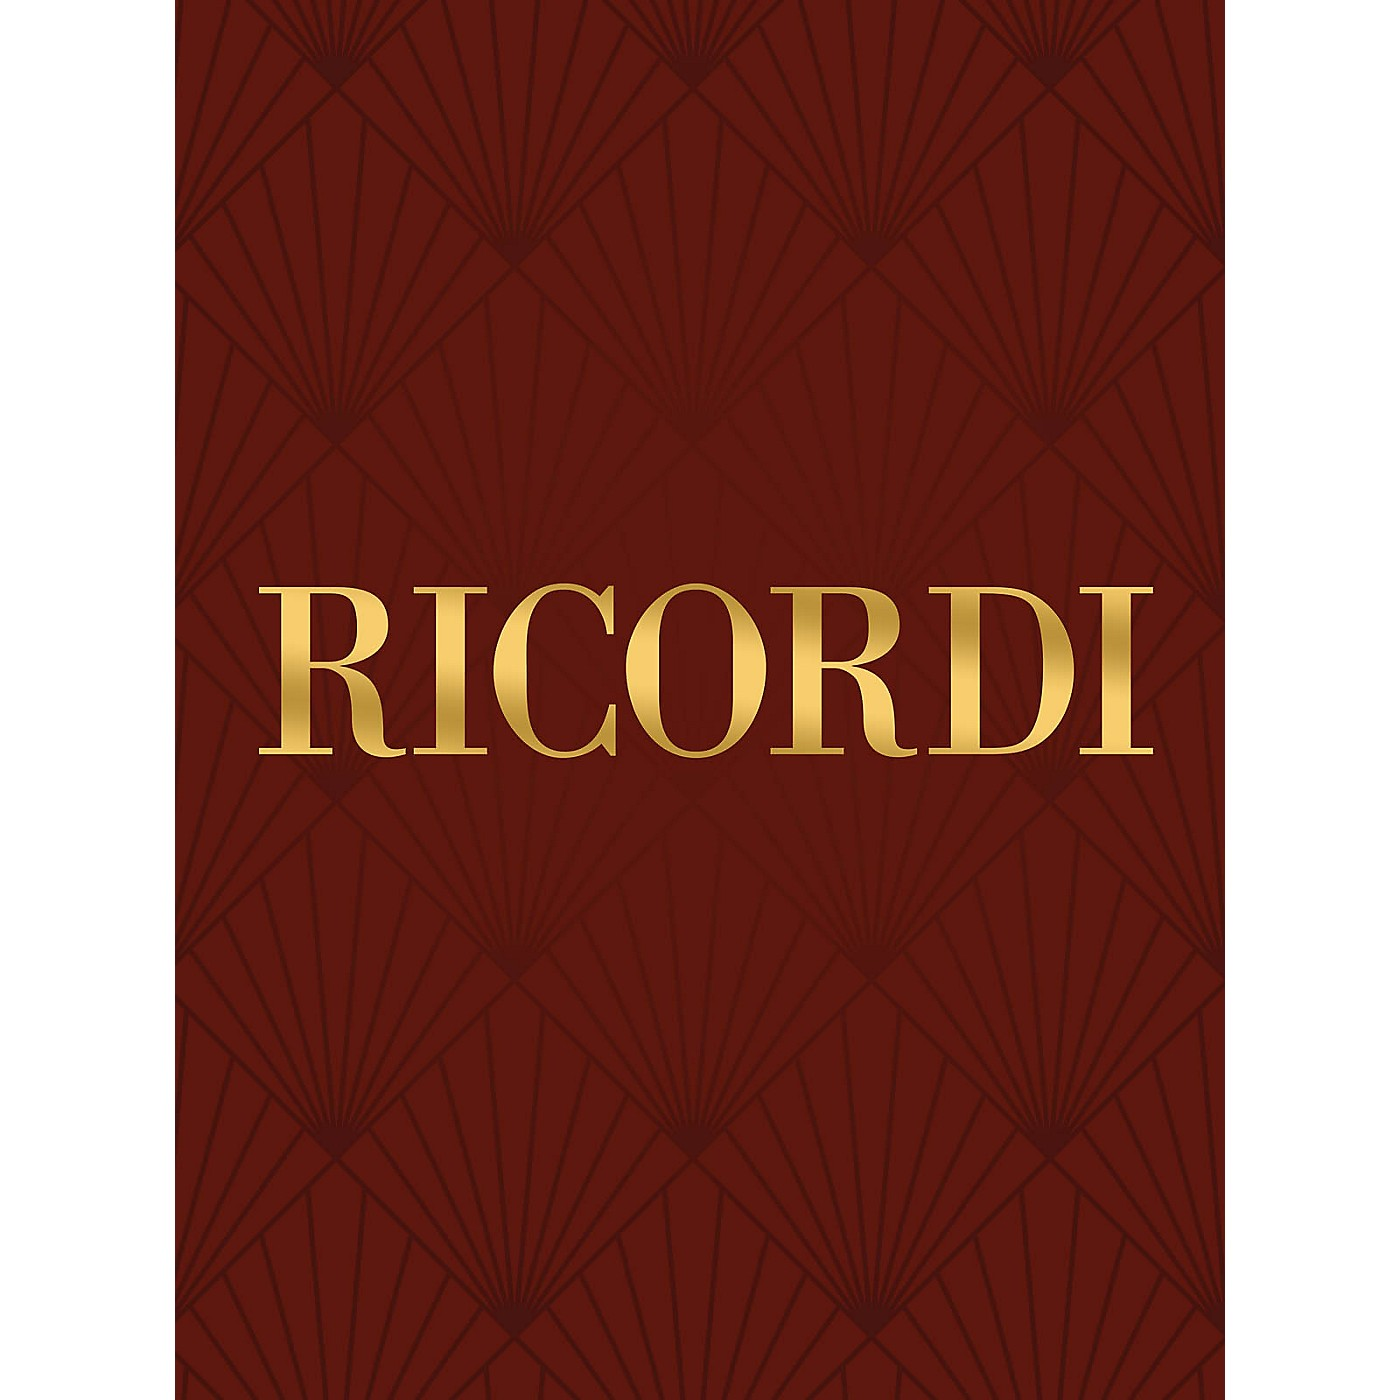 Ricordi Gran Metodo Part I: Teorico Pratico Progressivo (Trumpet Method) Special Import Series thumbnail